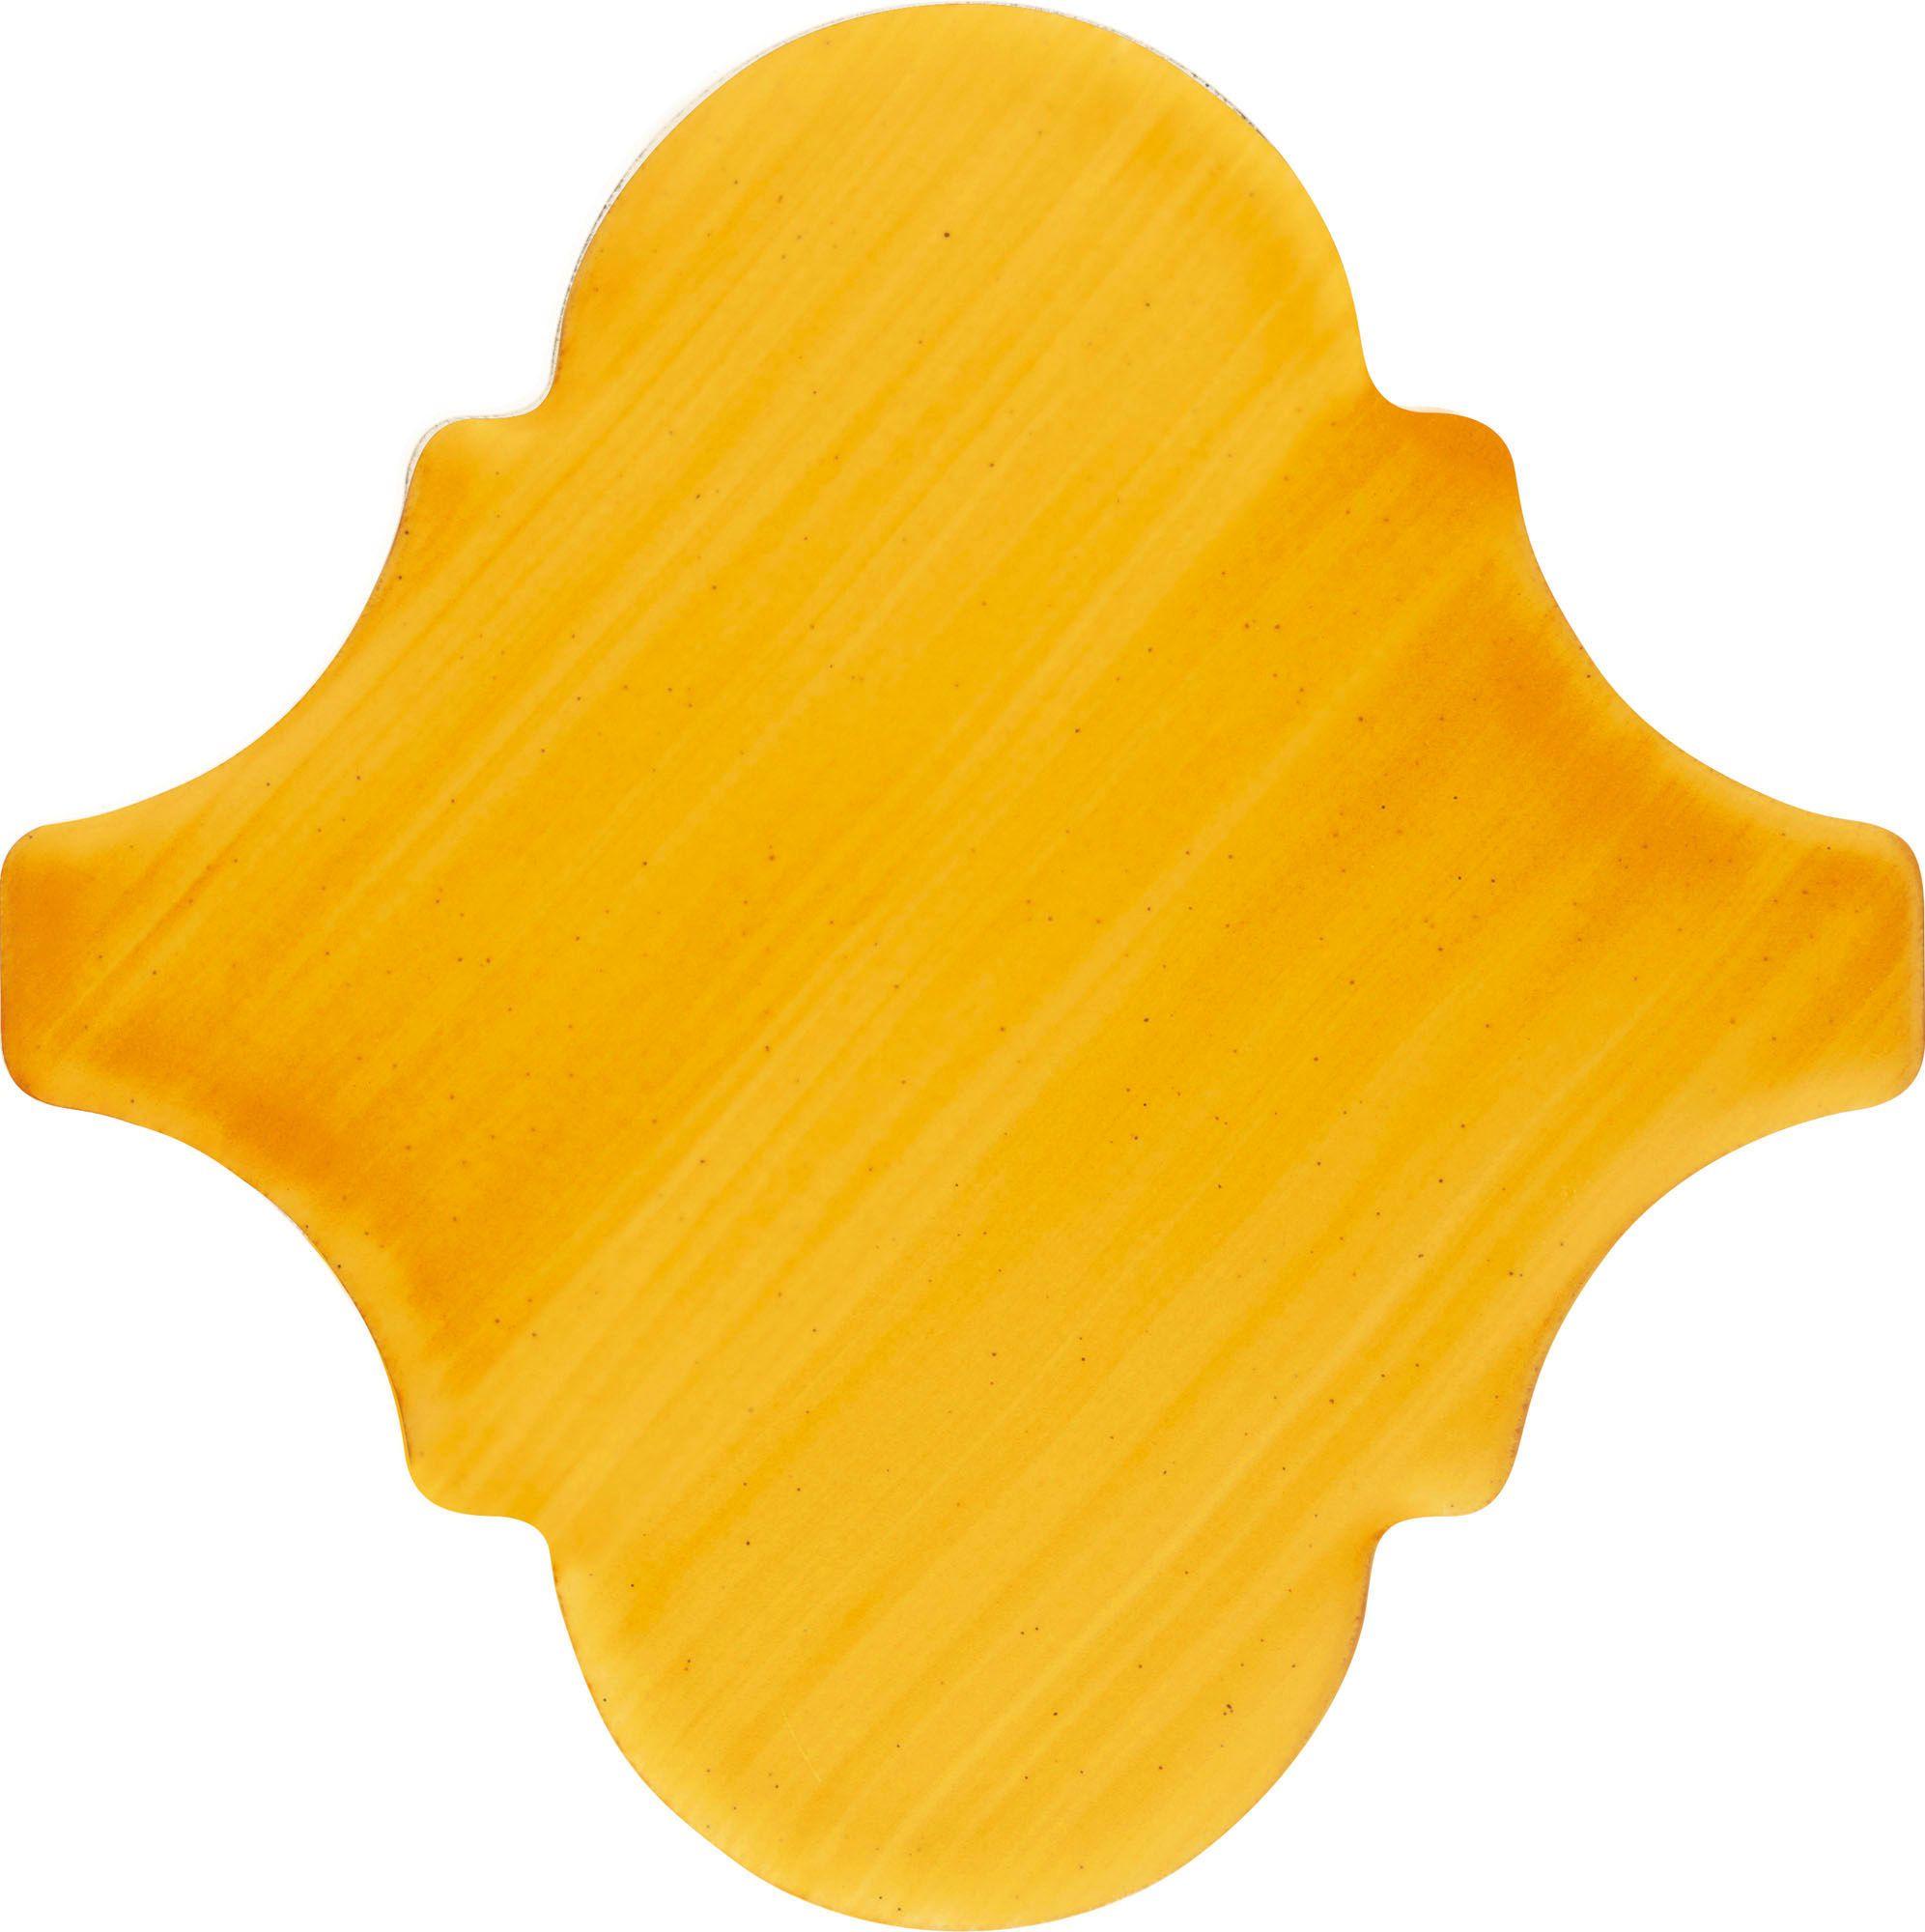 PF020 Color Art Plain Yellow Arabesque